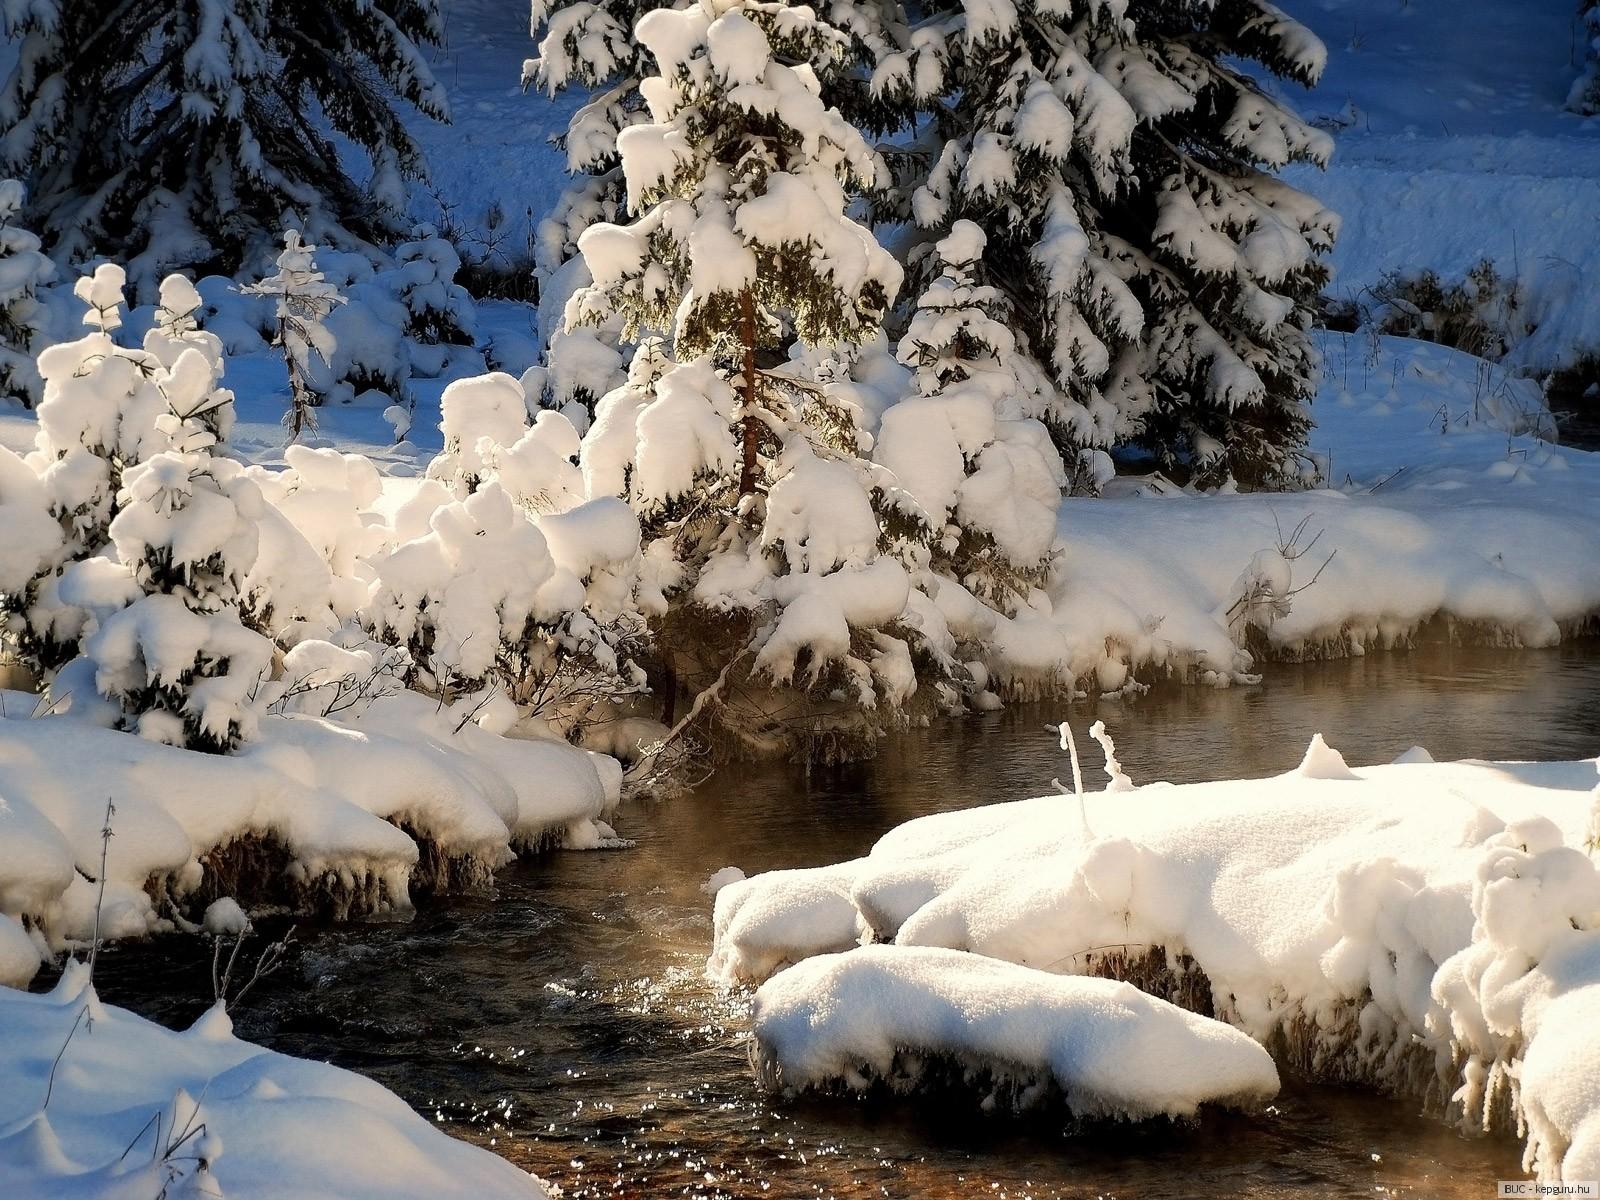 Wallpaper ไหนว่าปีนี้จะหนาวสุดในรอบ 30 ปี 50 Pic 229889-svetik